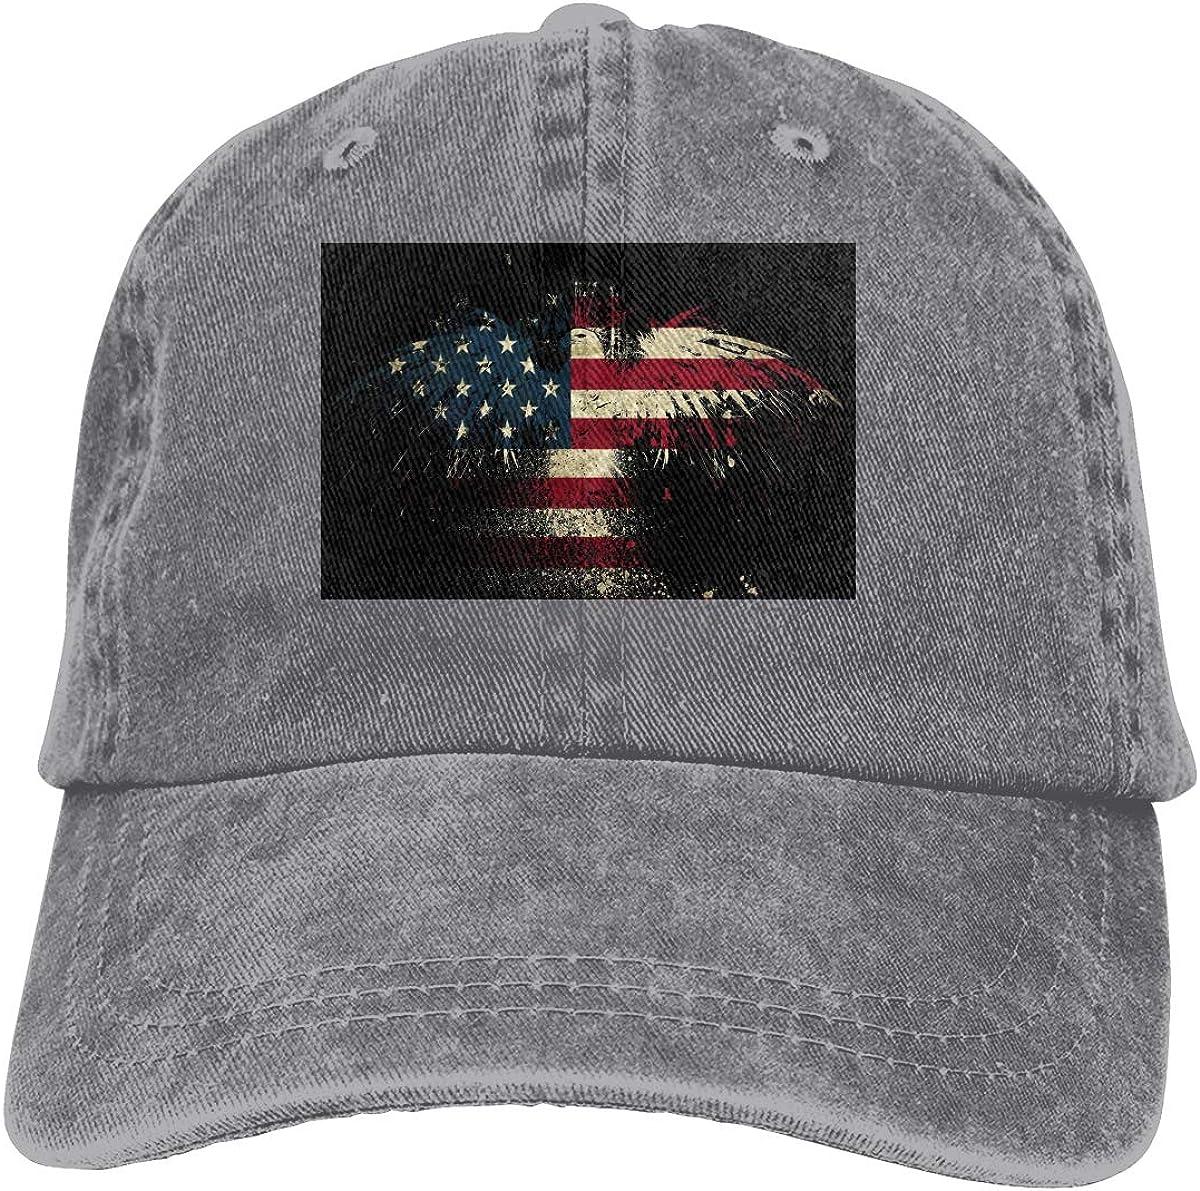 Eagle American Flag Denim Hat Adjustable Plain Cap Baseball Caps